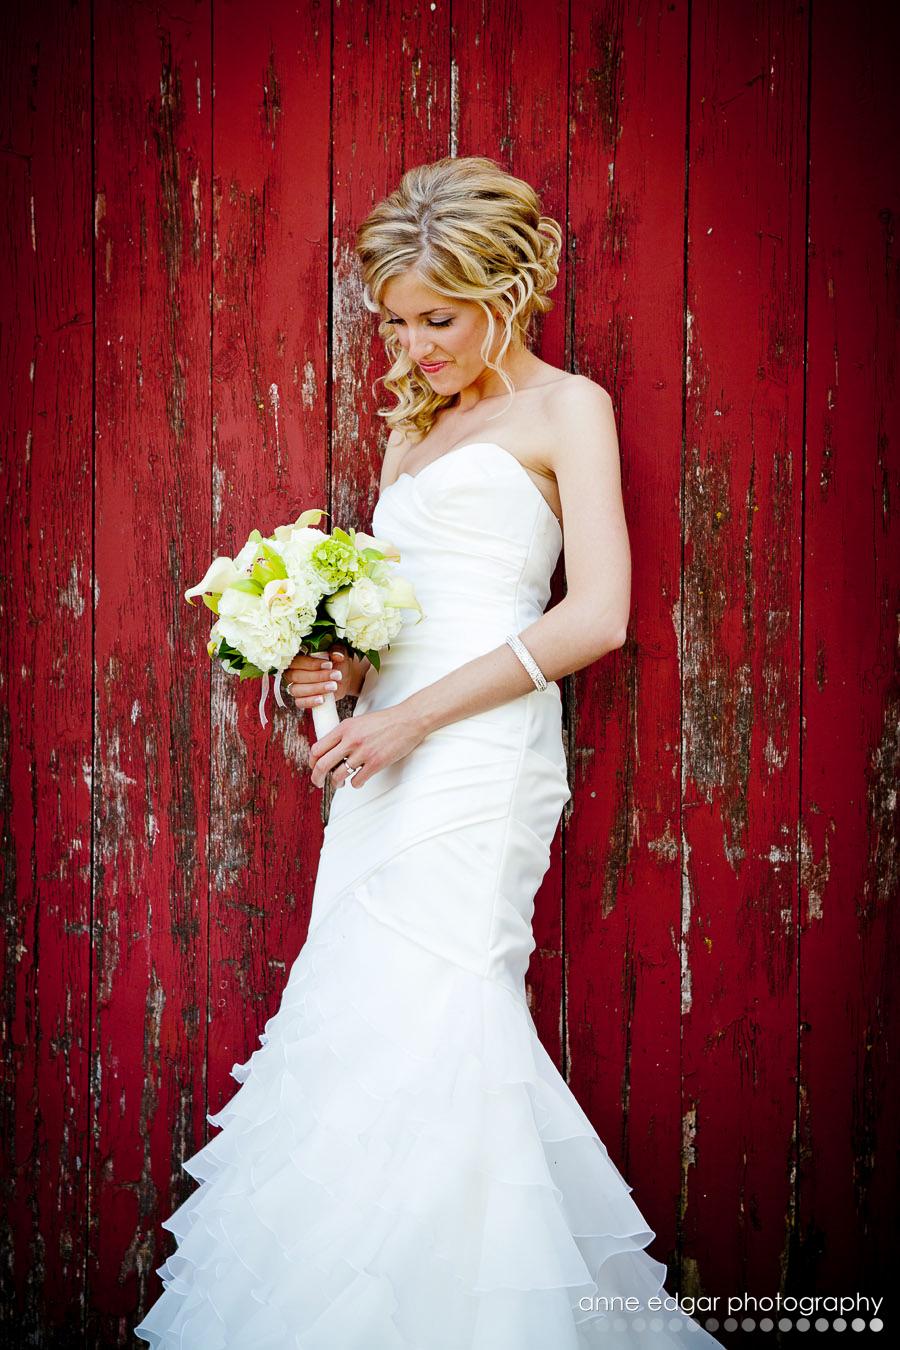 Good flyleaf beautiful bride 09 that necessary